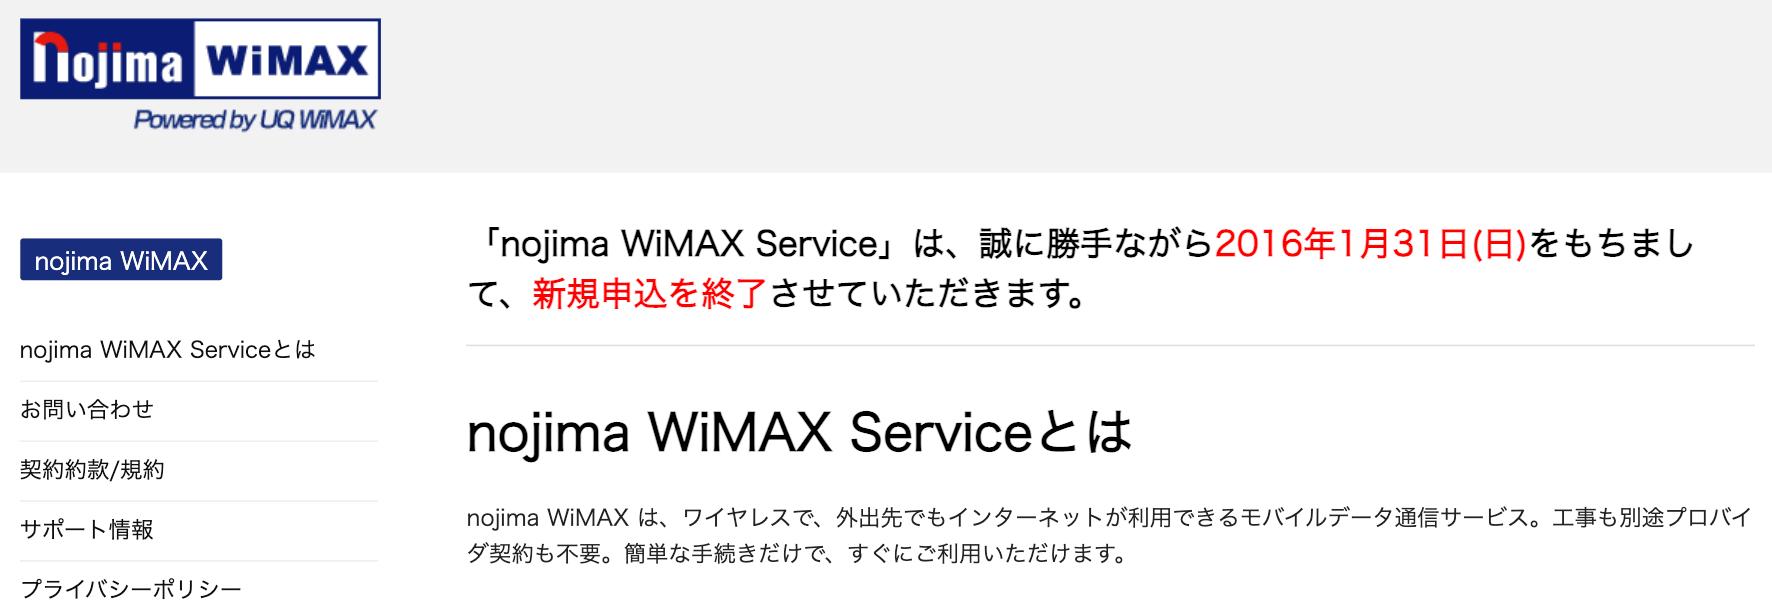 nojimaWiMAXのトップページ